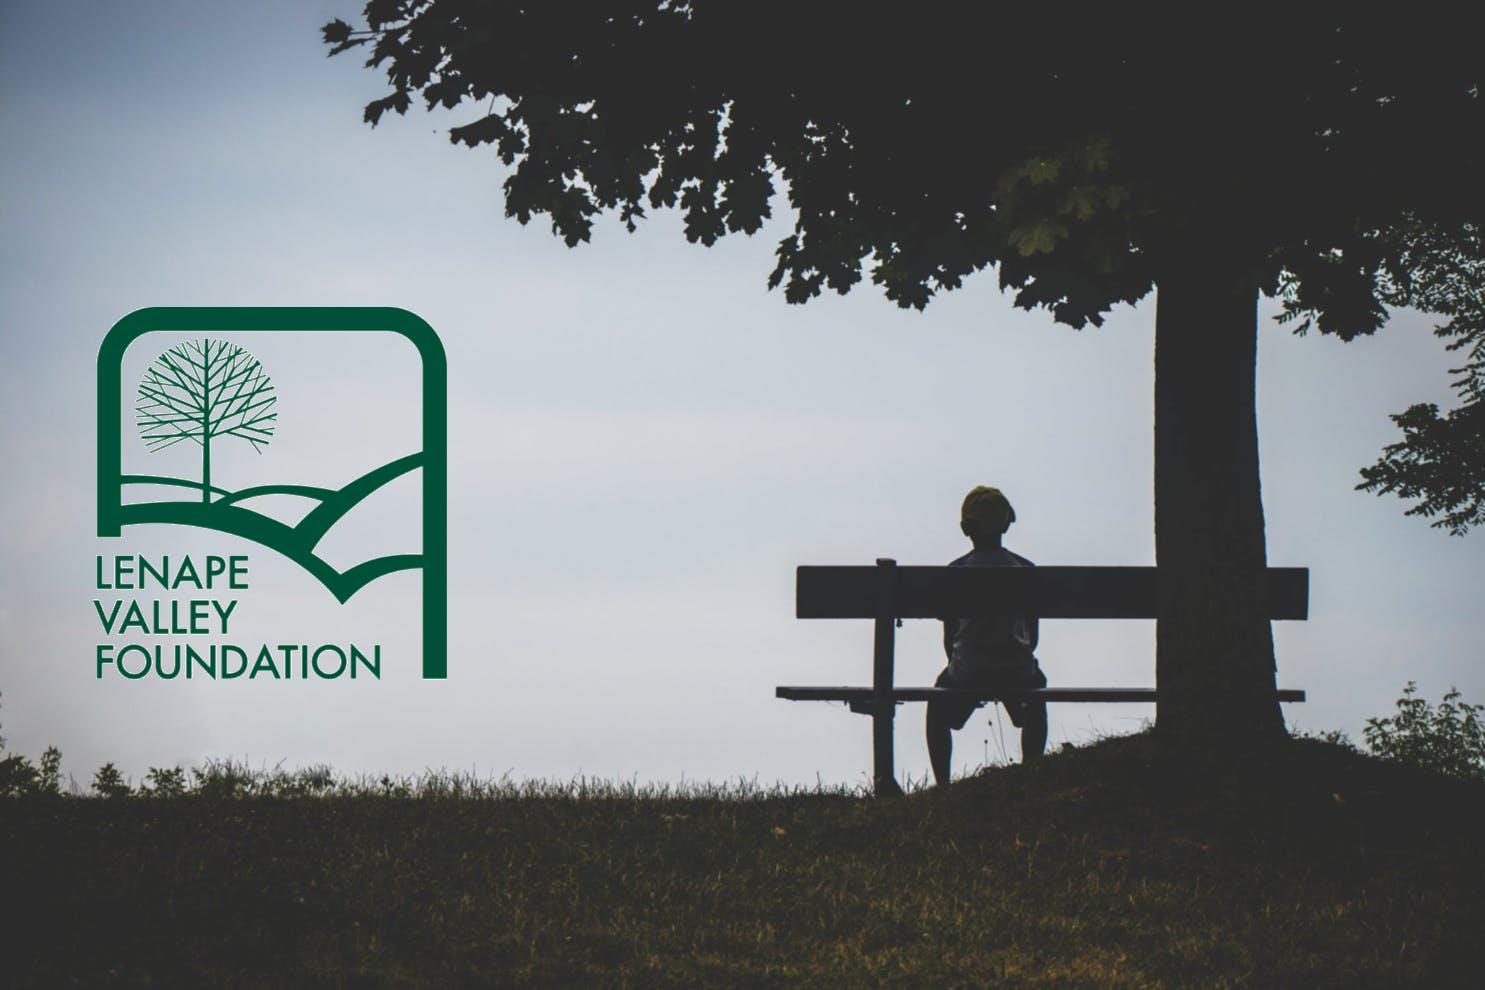 Lenape Valley Foundation's 2019 Suicide Prevention Conference